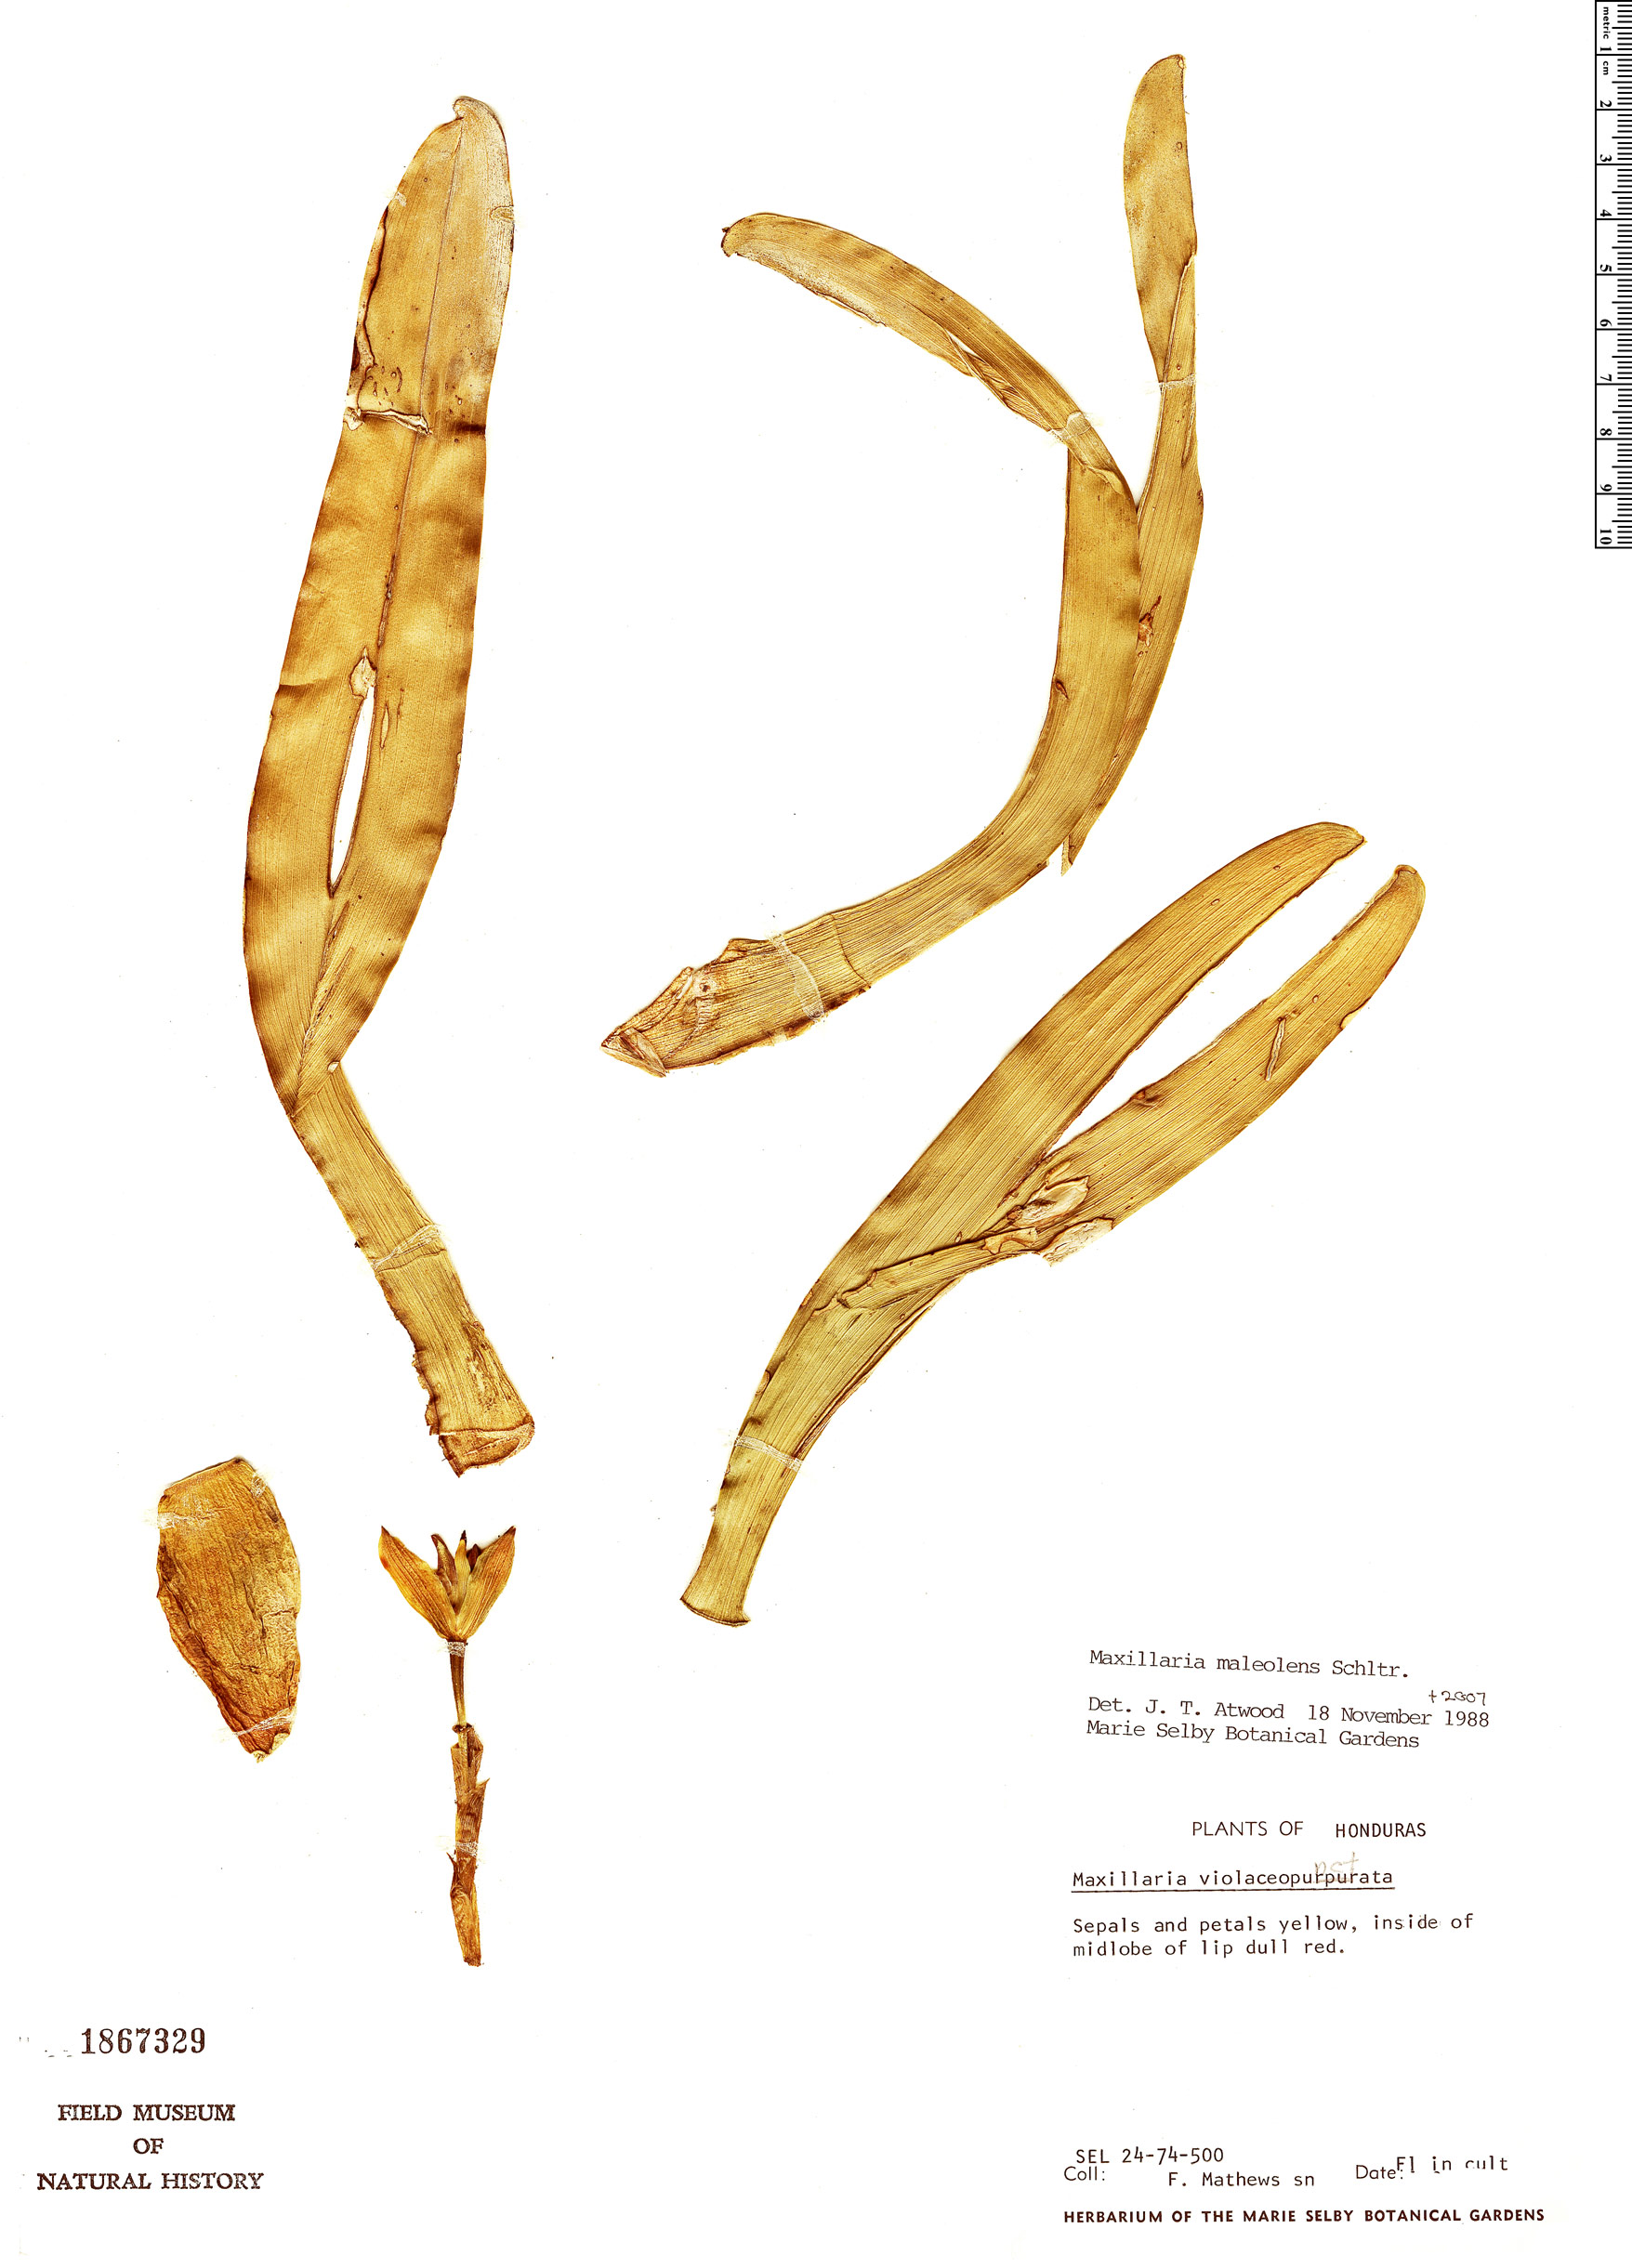 Specimen: Maxillaria maleolens